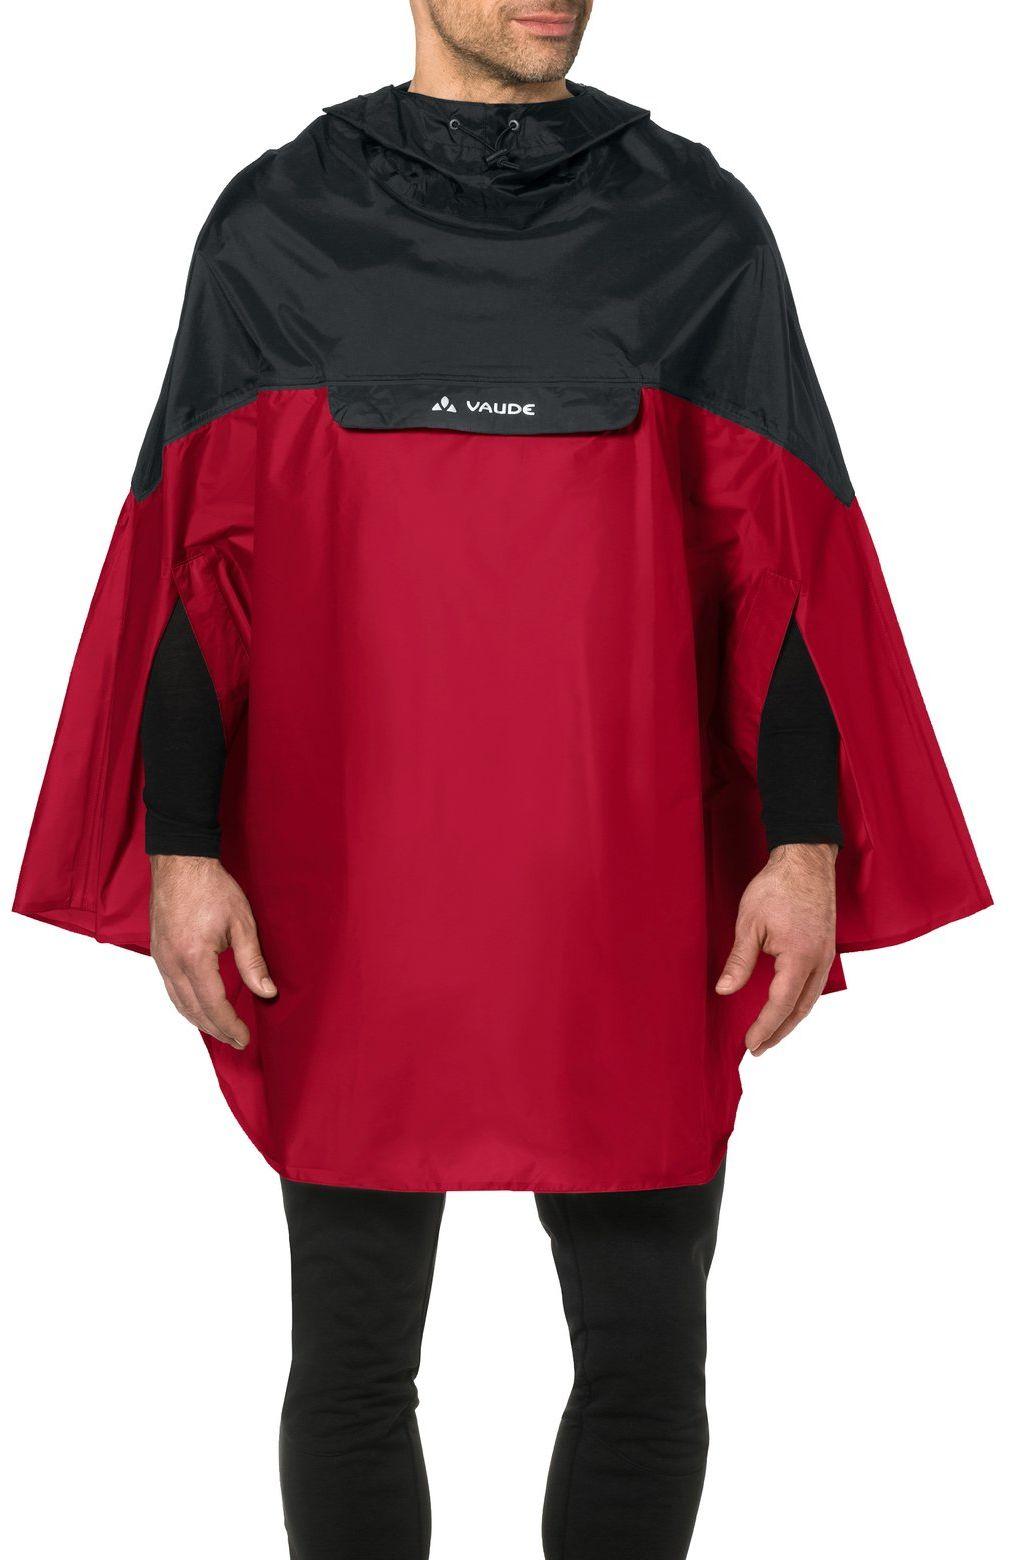 VAUDE Poncho męskie Covero Poncho II, indian red, L, 068096140400